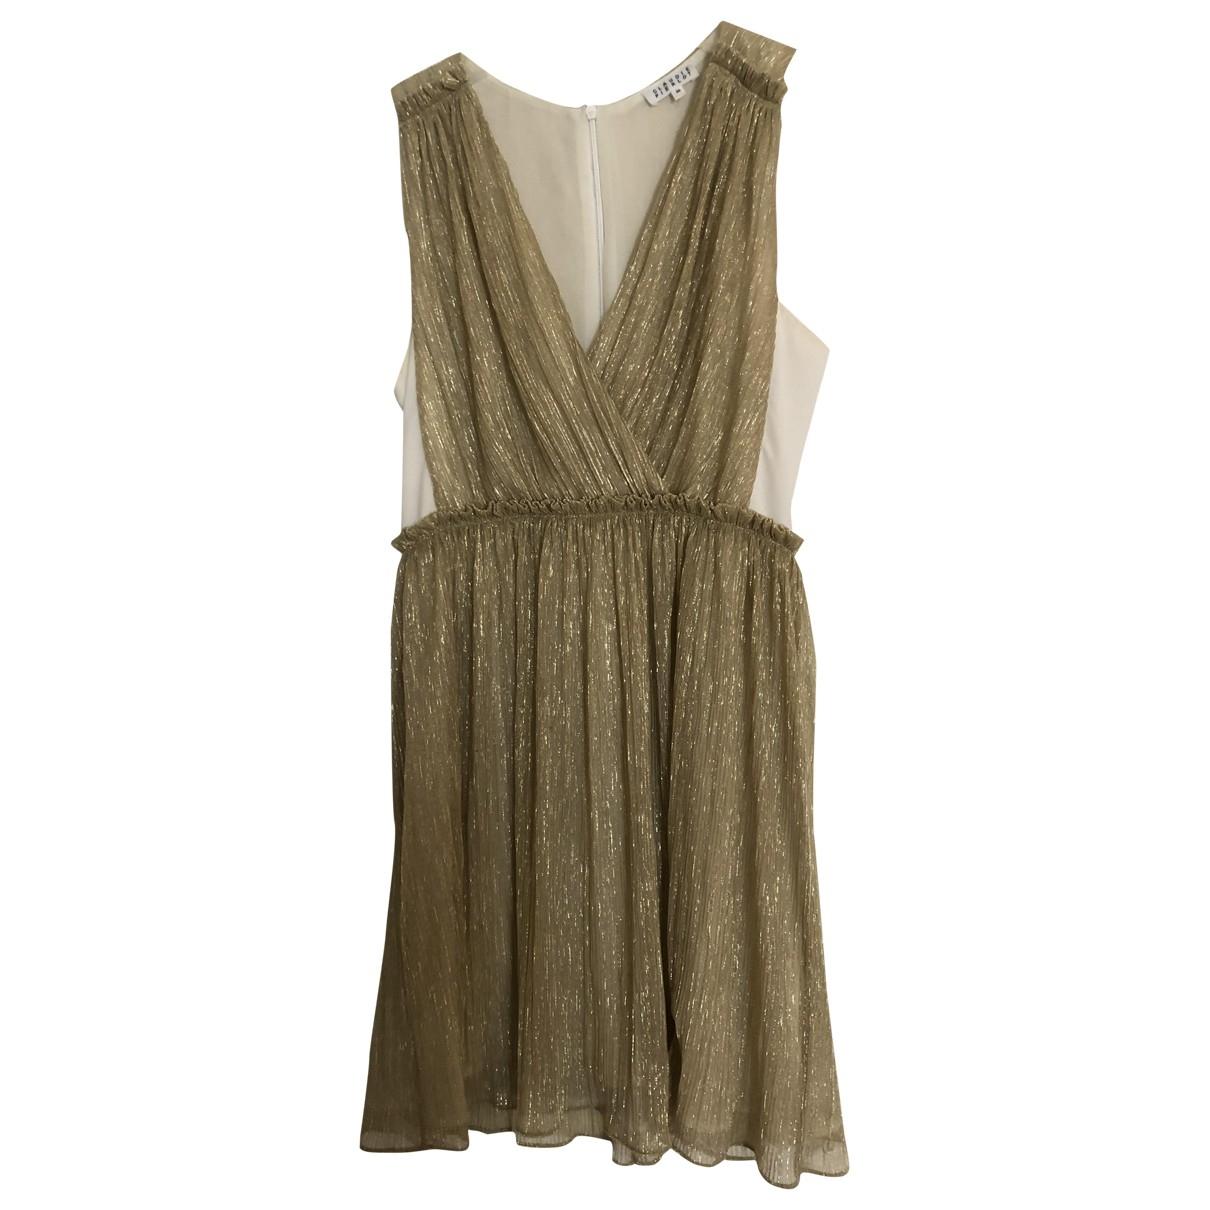 Claudie Pierlot \N Gold dress for Women 36 FR